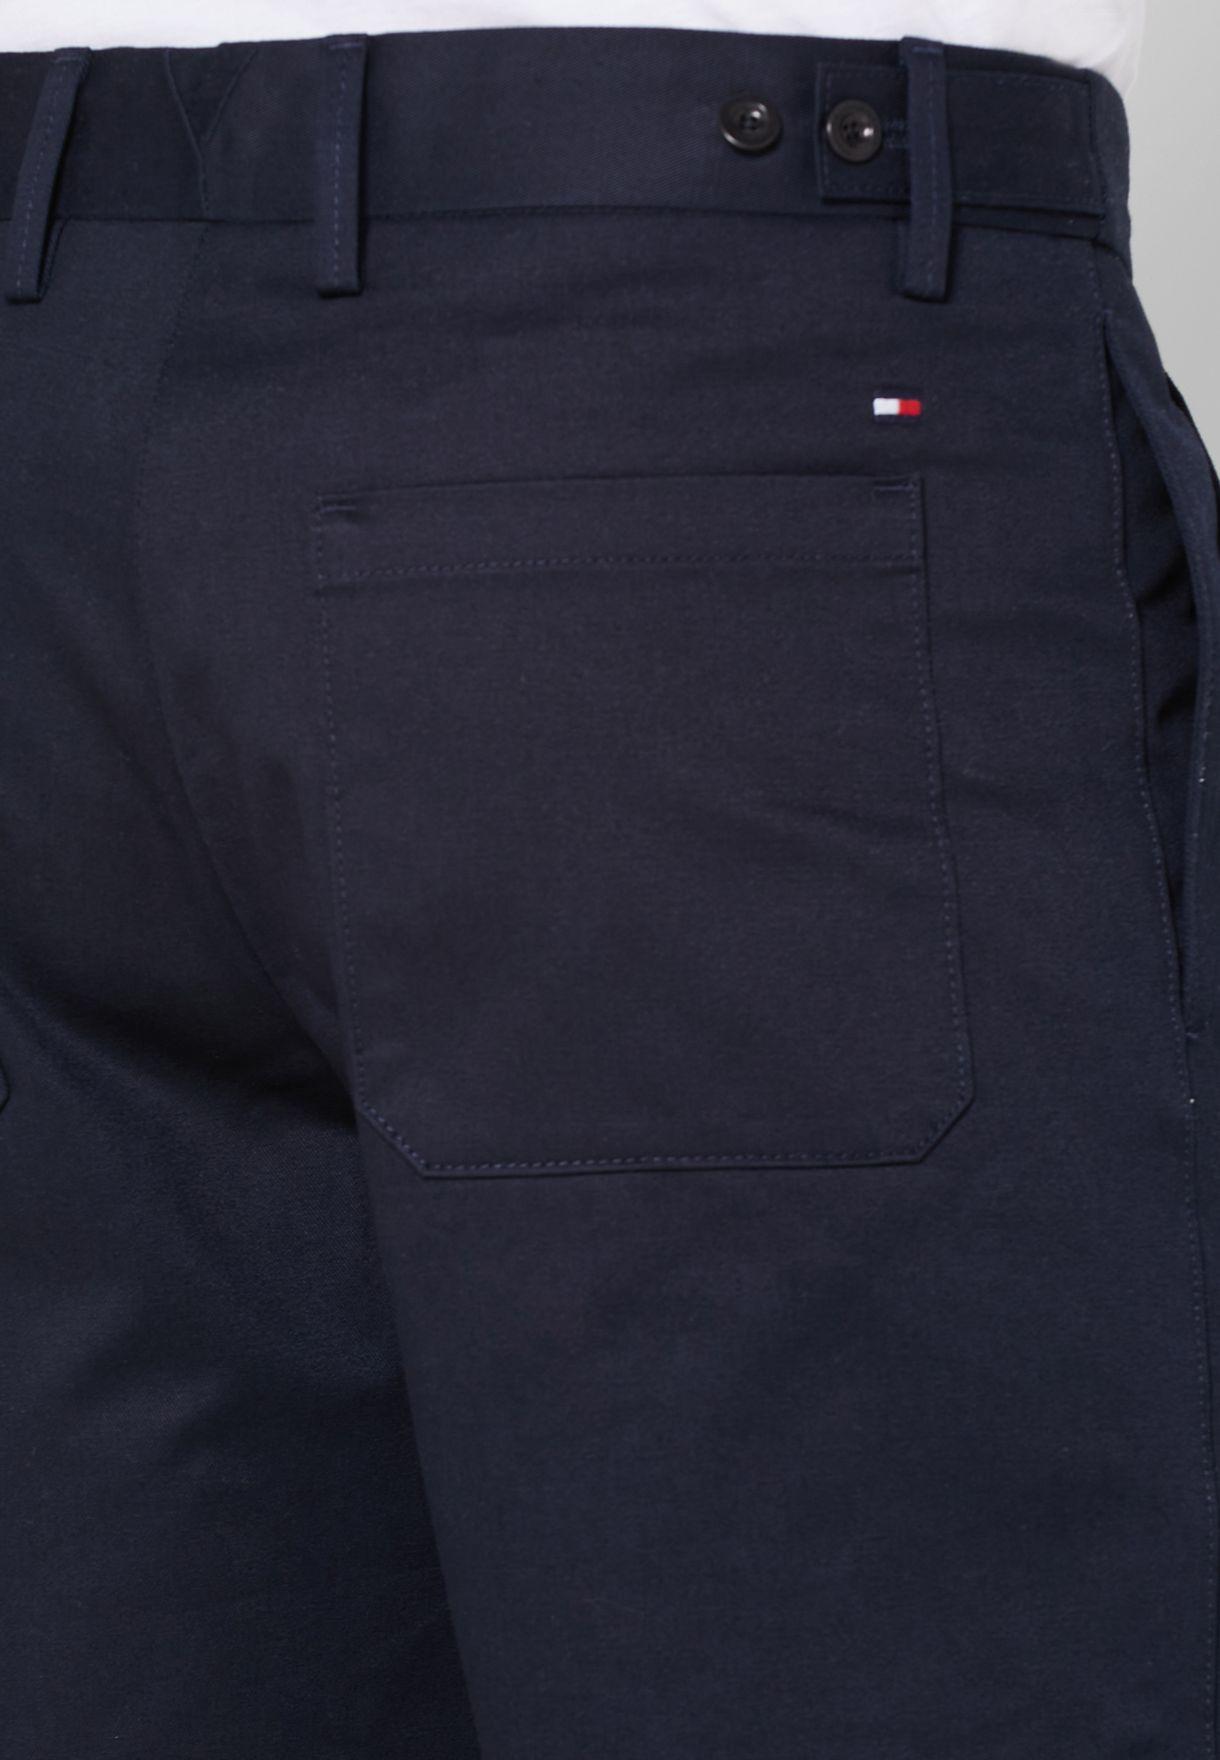 Authentic Shorts